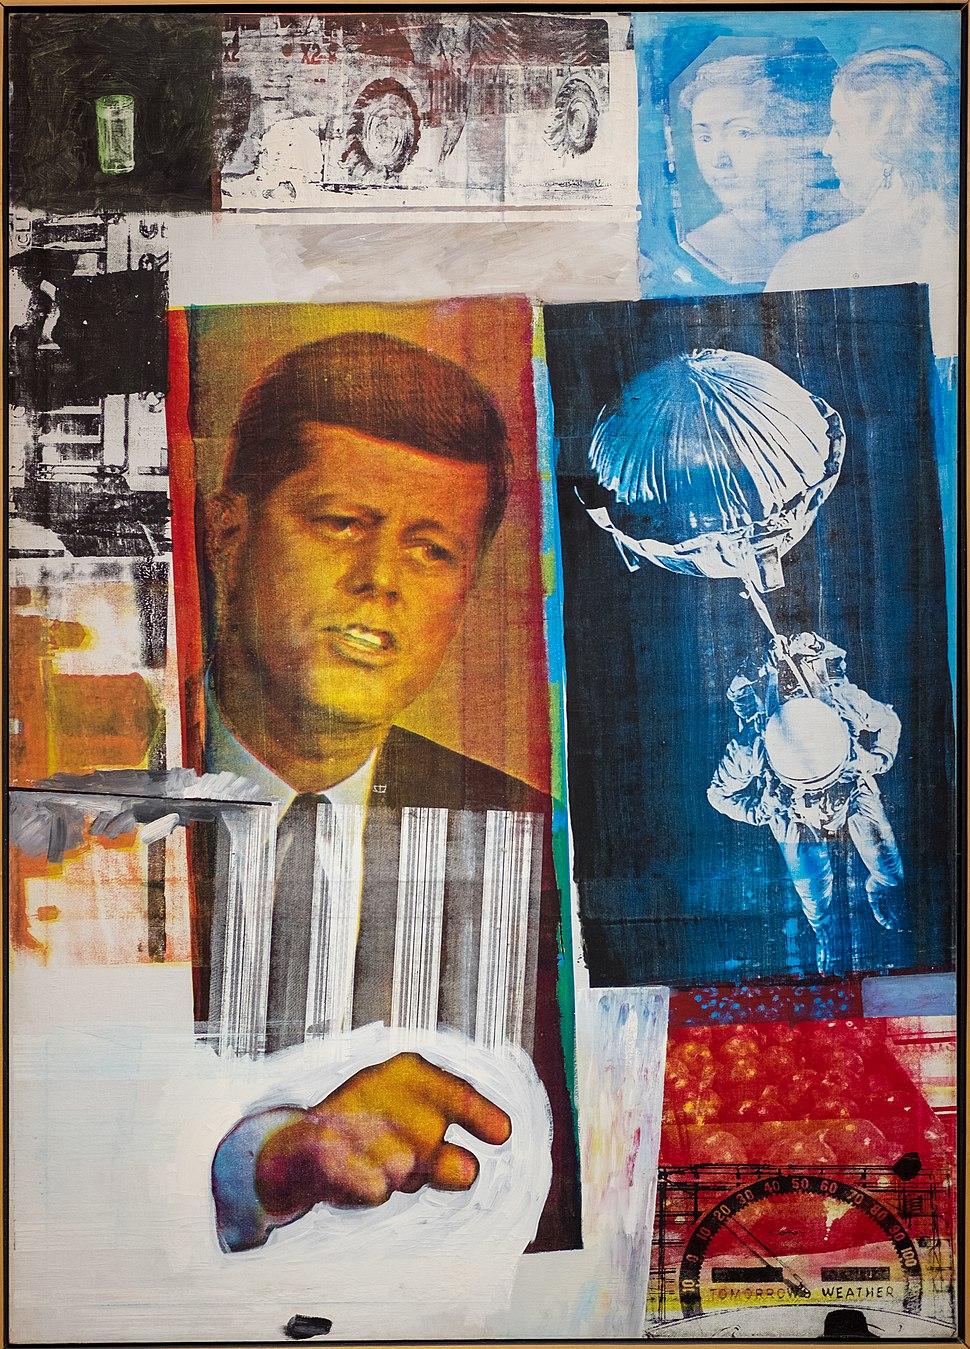 Robert Rauschenberg, Retroactive II, 1963 1 26 18 -mcachicago (38559559950)